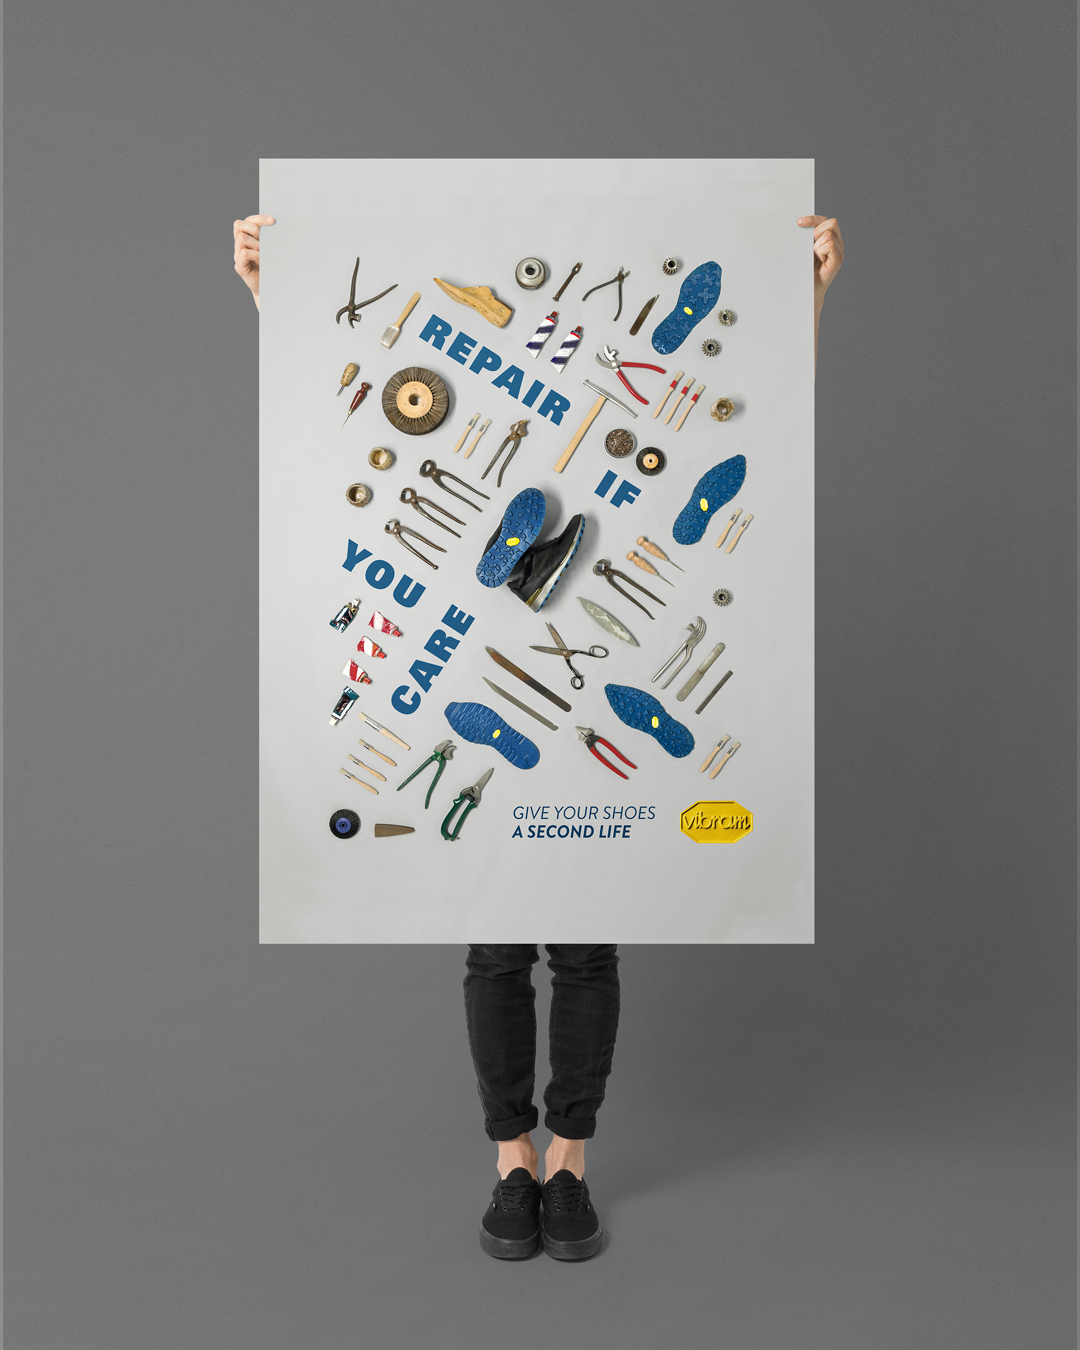 vibram adv repair if you care advertising poster shoes fashion tools creative drogheria studio graphic design studio campaign